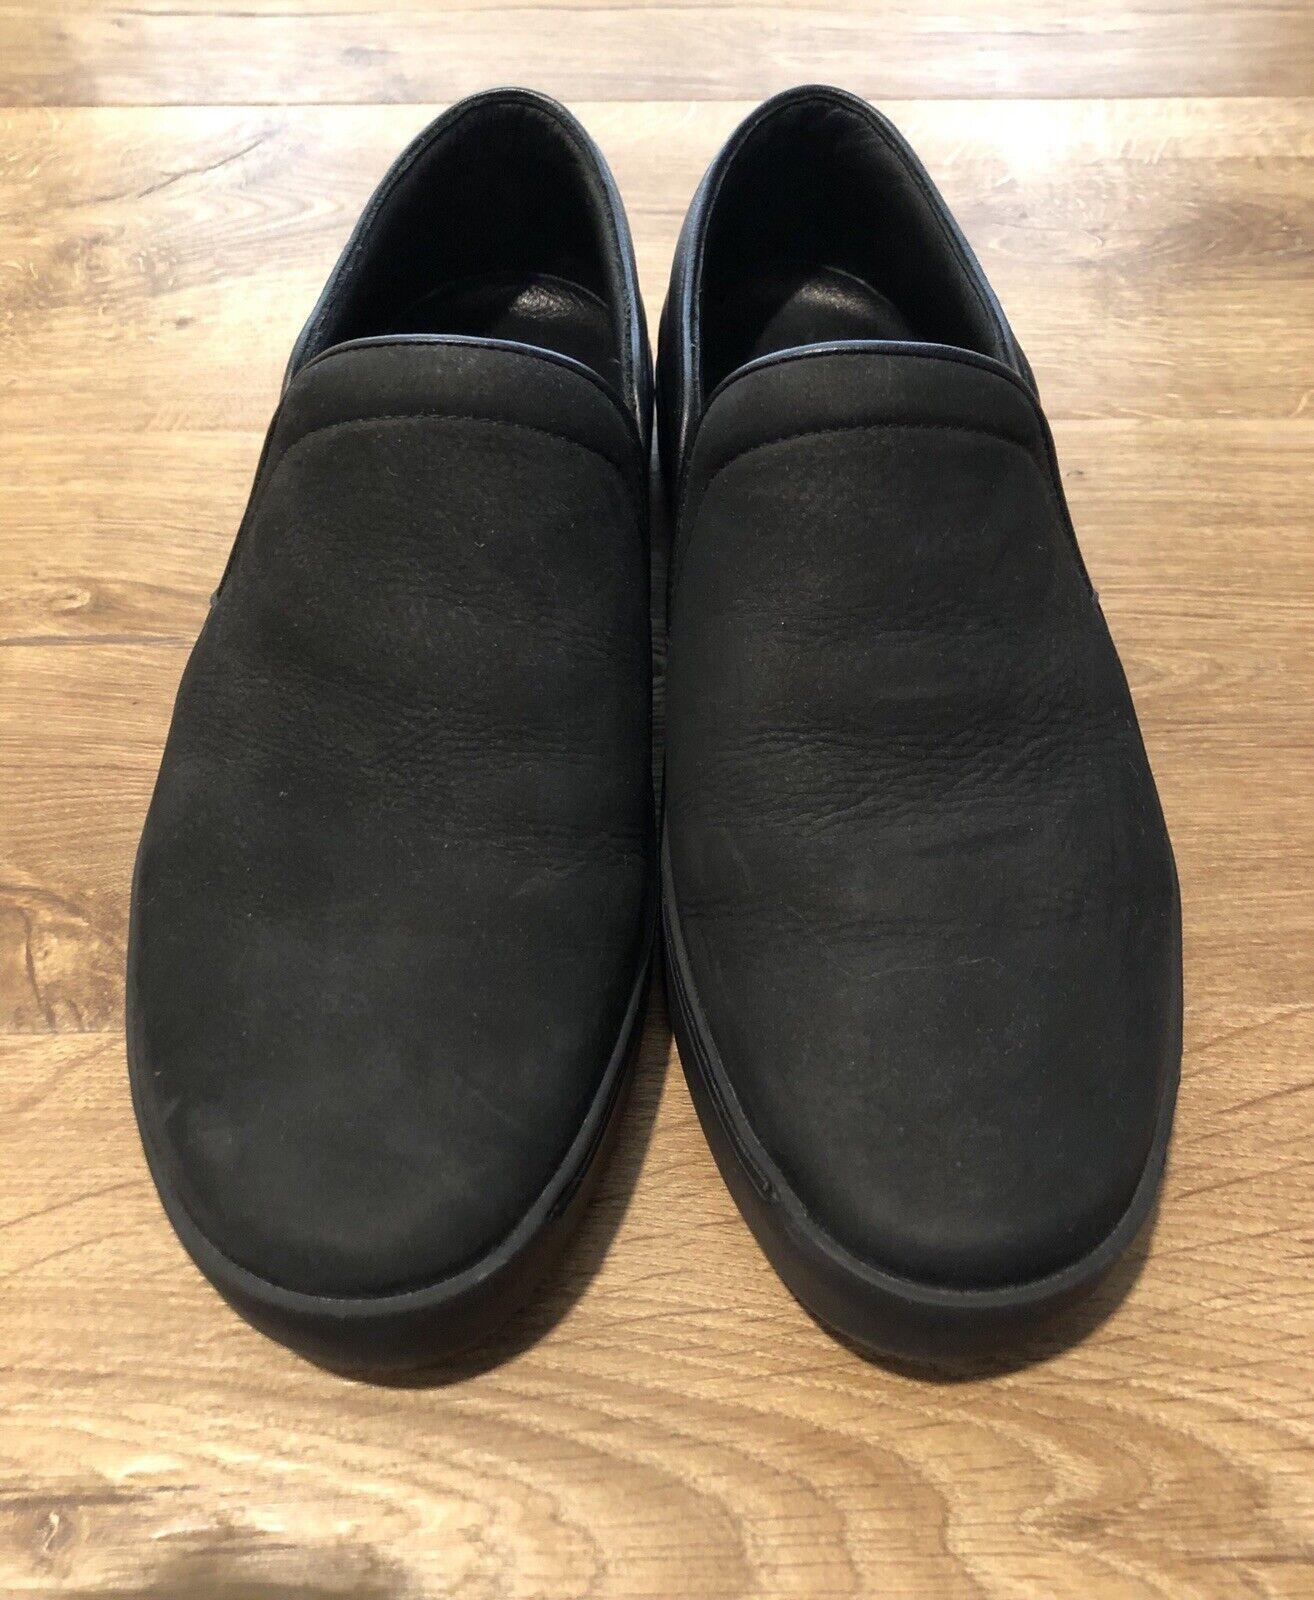 RAG & BONE  KENT 'Cuero Gamuza Negra Para Hombres Slip-on Loafer Tamaño Euro 42  325